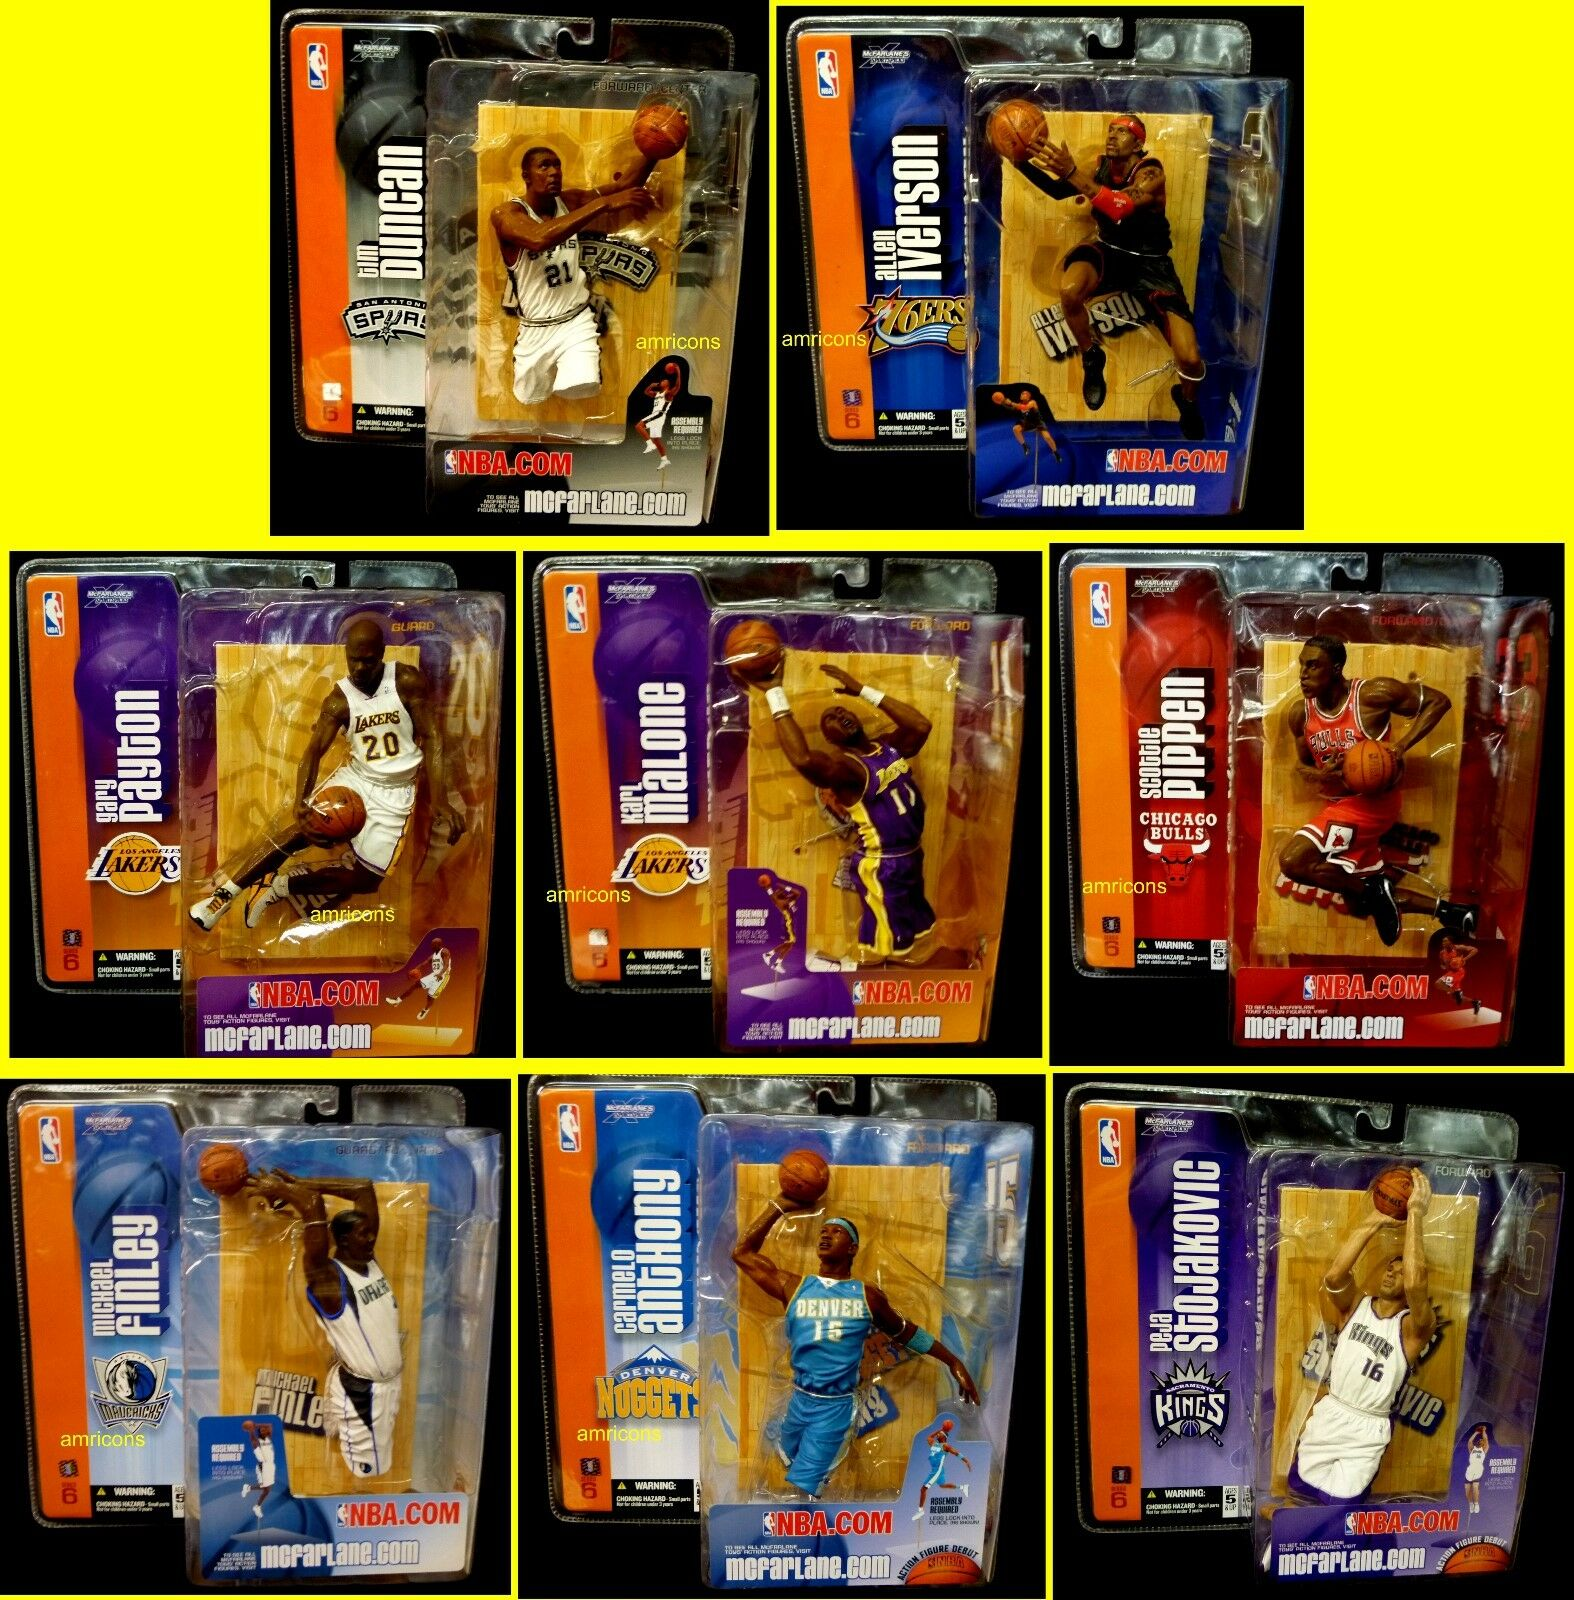 McFarlane Sports NBA Basketball Series 6 Set of 8 Action Figures Duncan 2004 .